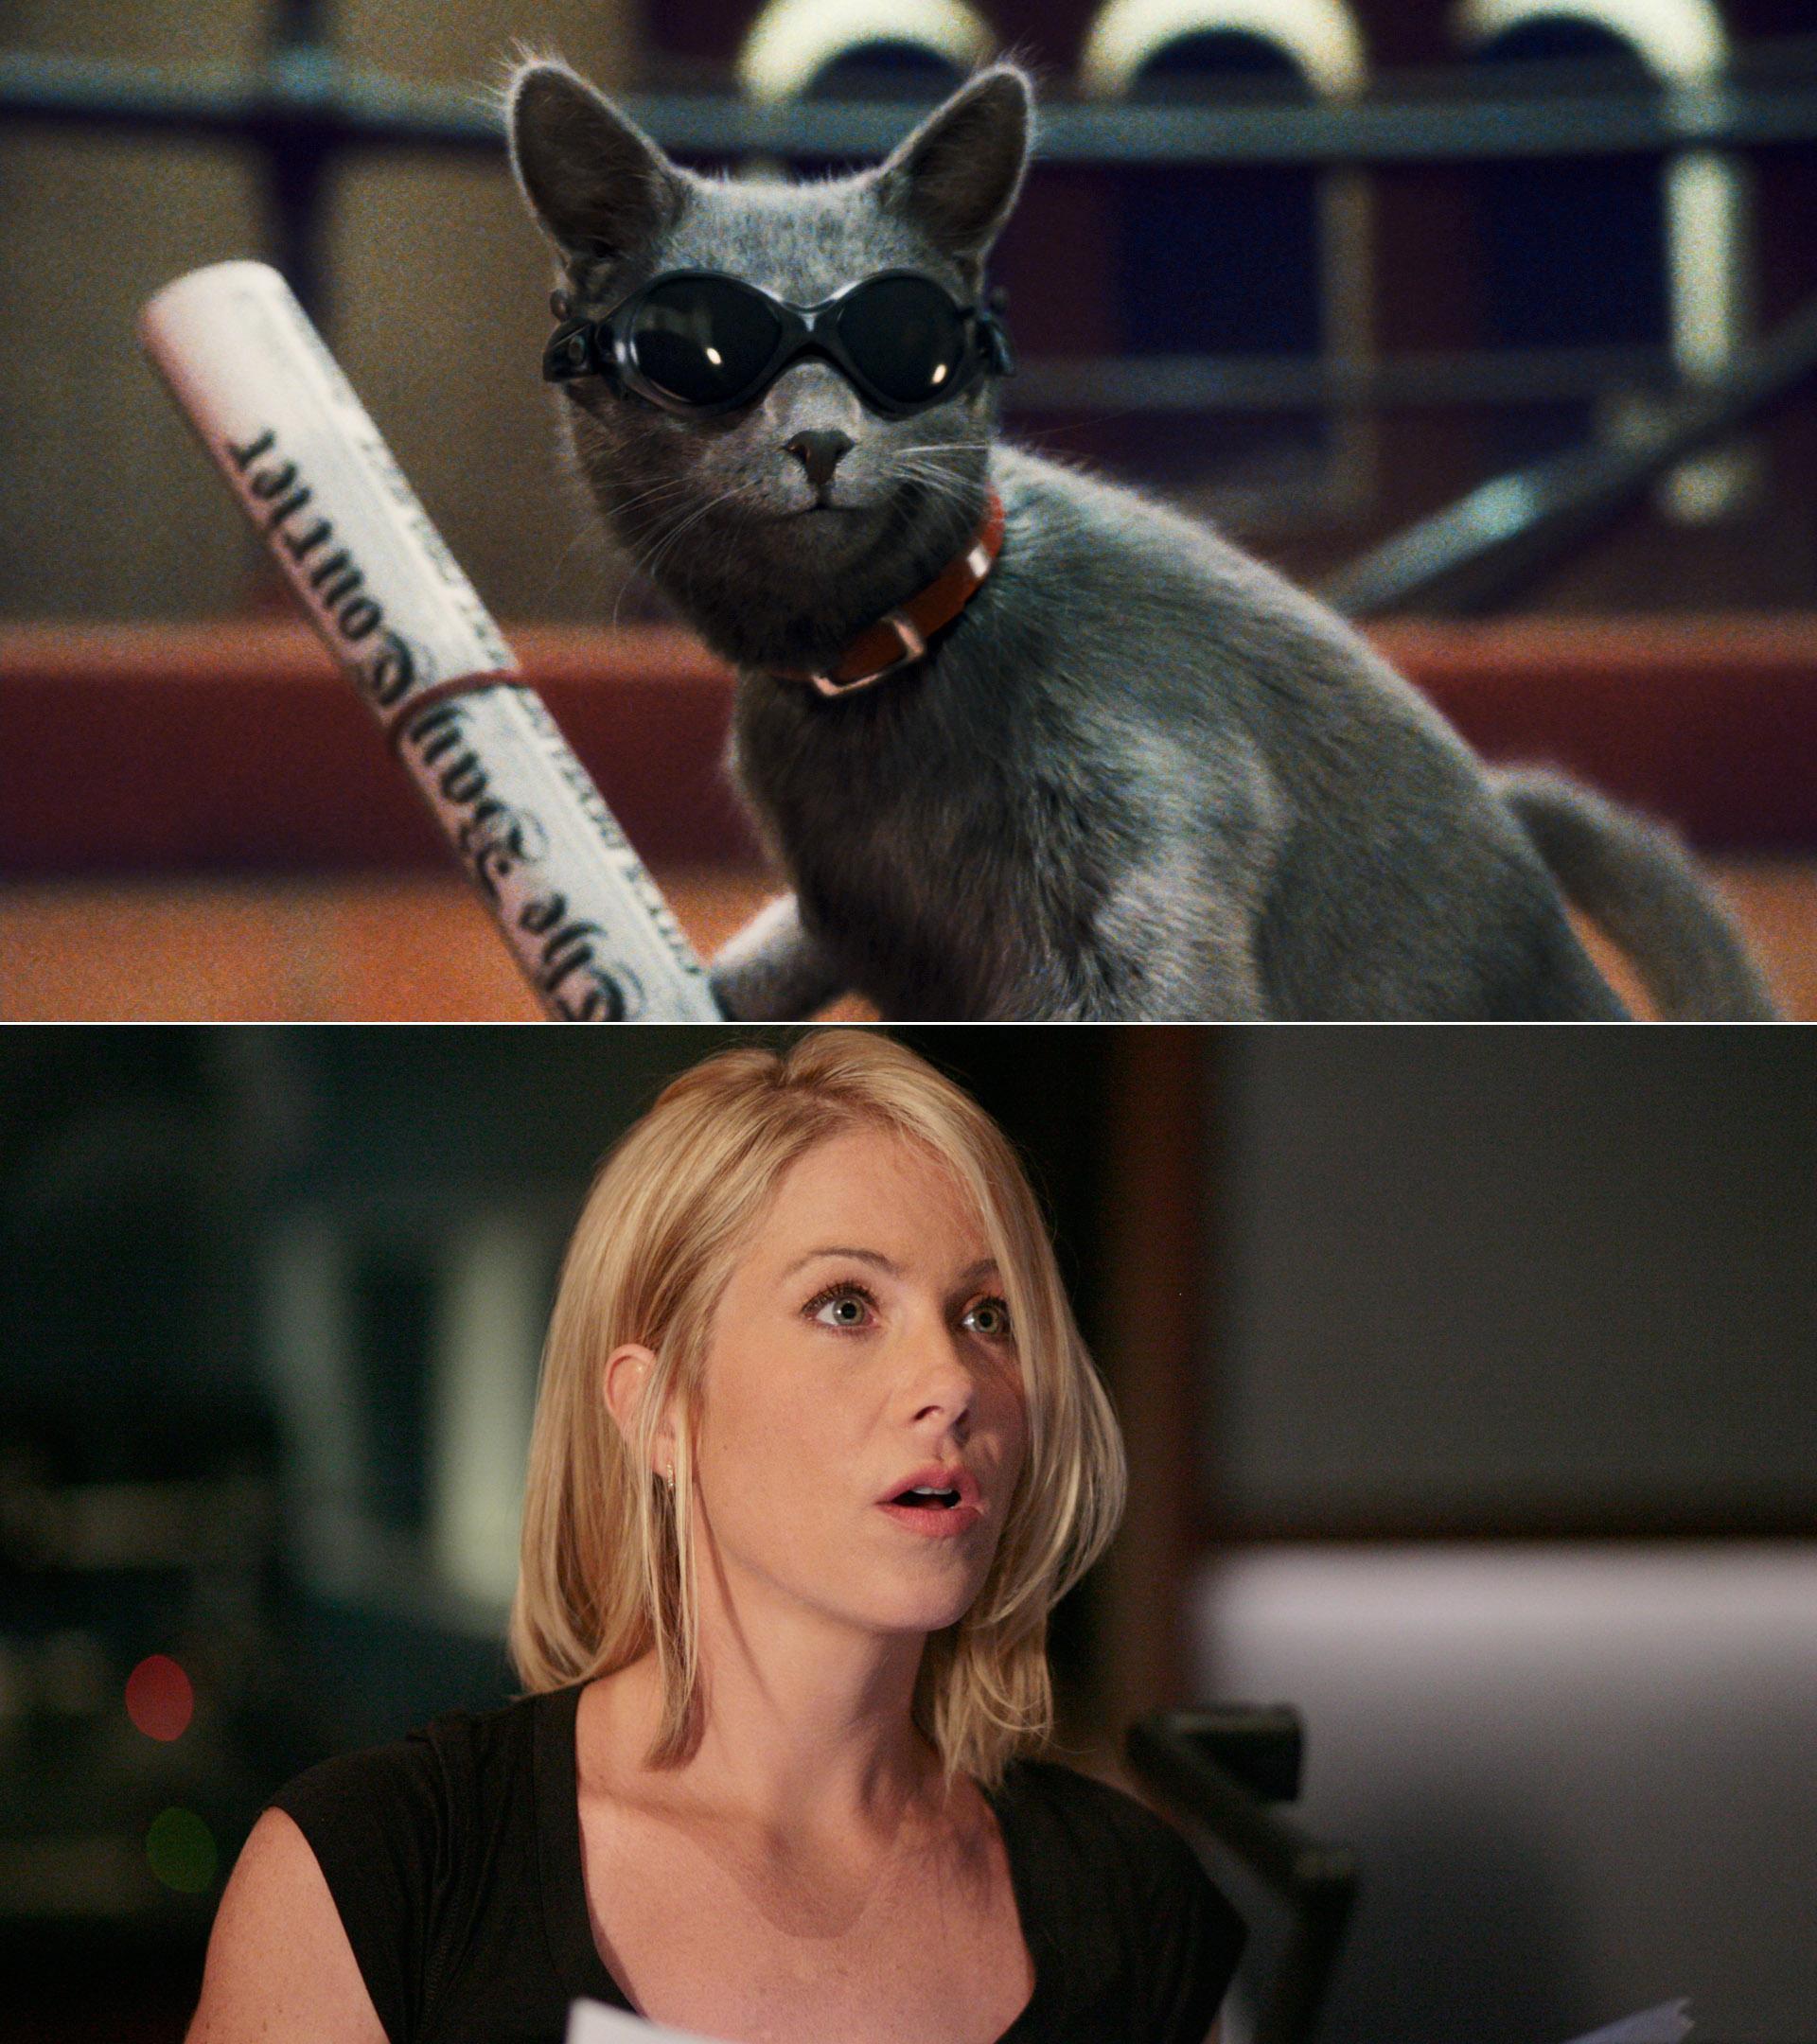 Картинки кошки против женщин